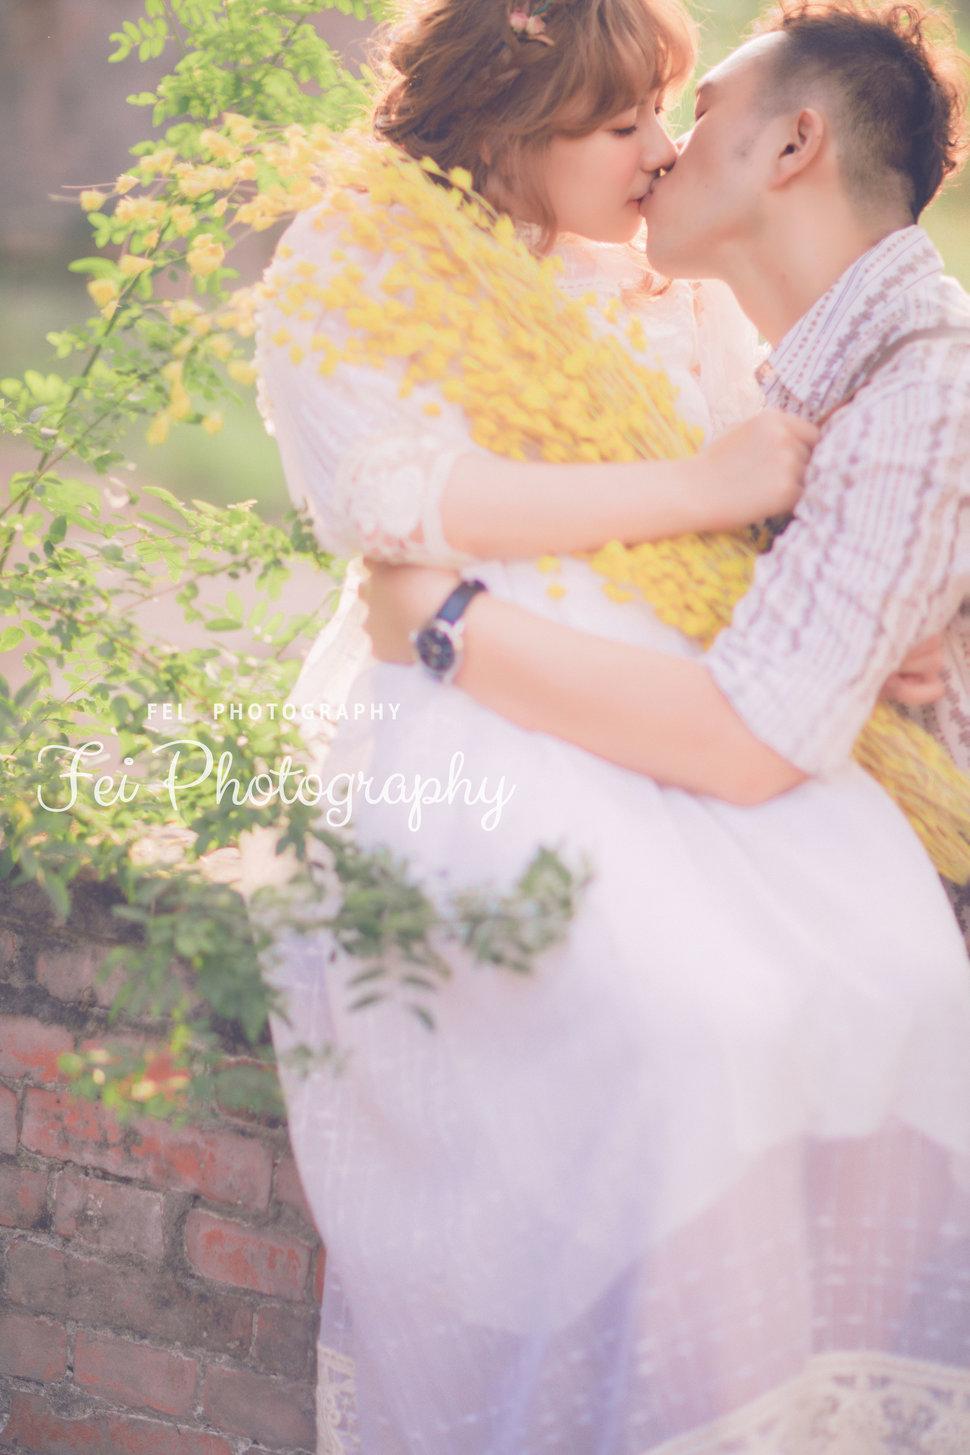 27 - 飛妃 Photography/女攝影師《結婚吧》